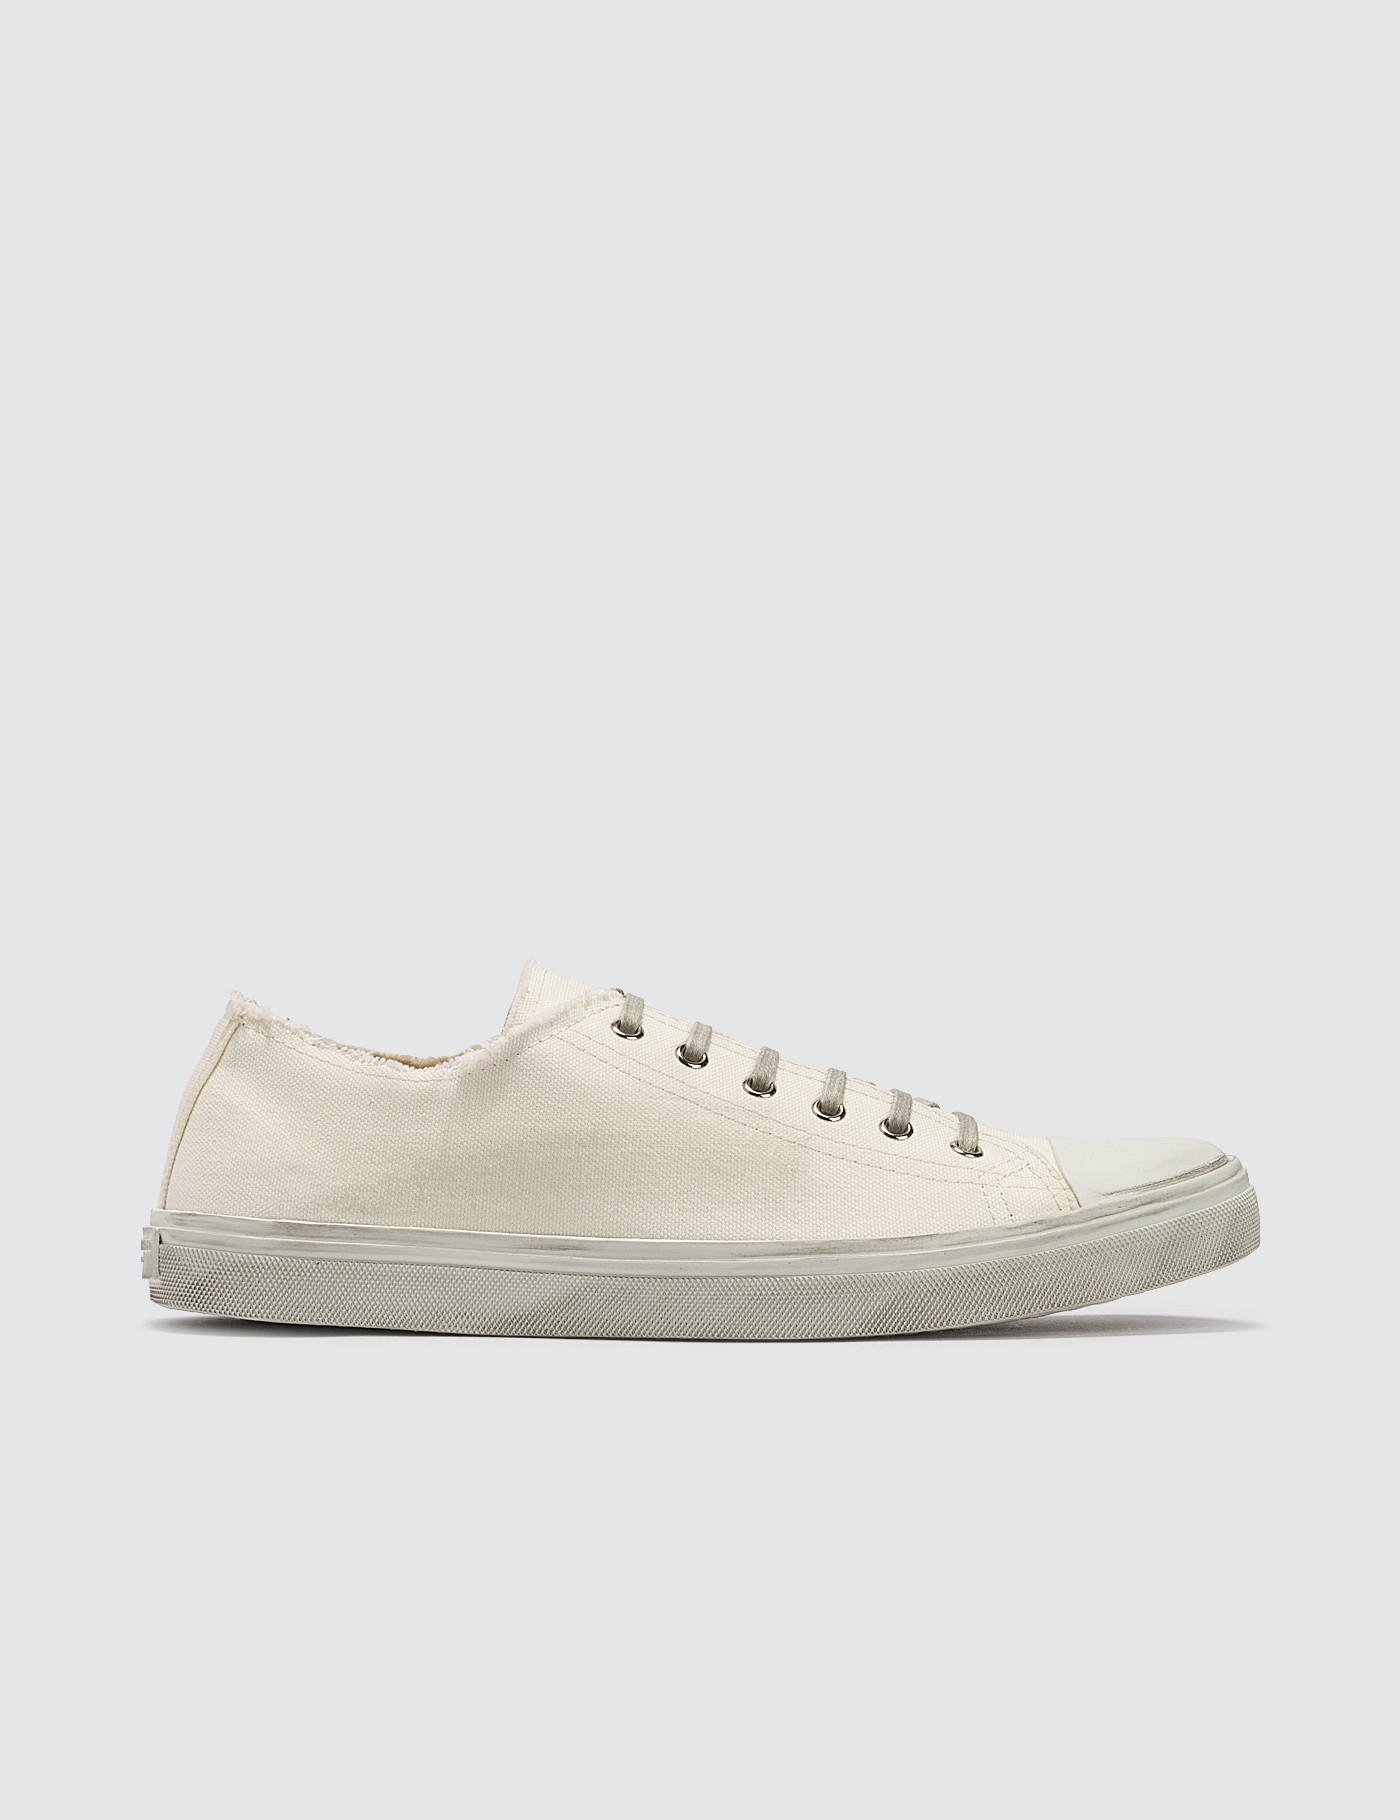 Saint Laurent - Bedford Sneakers In